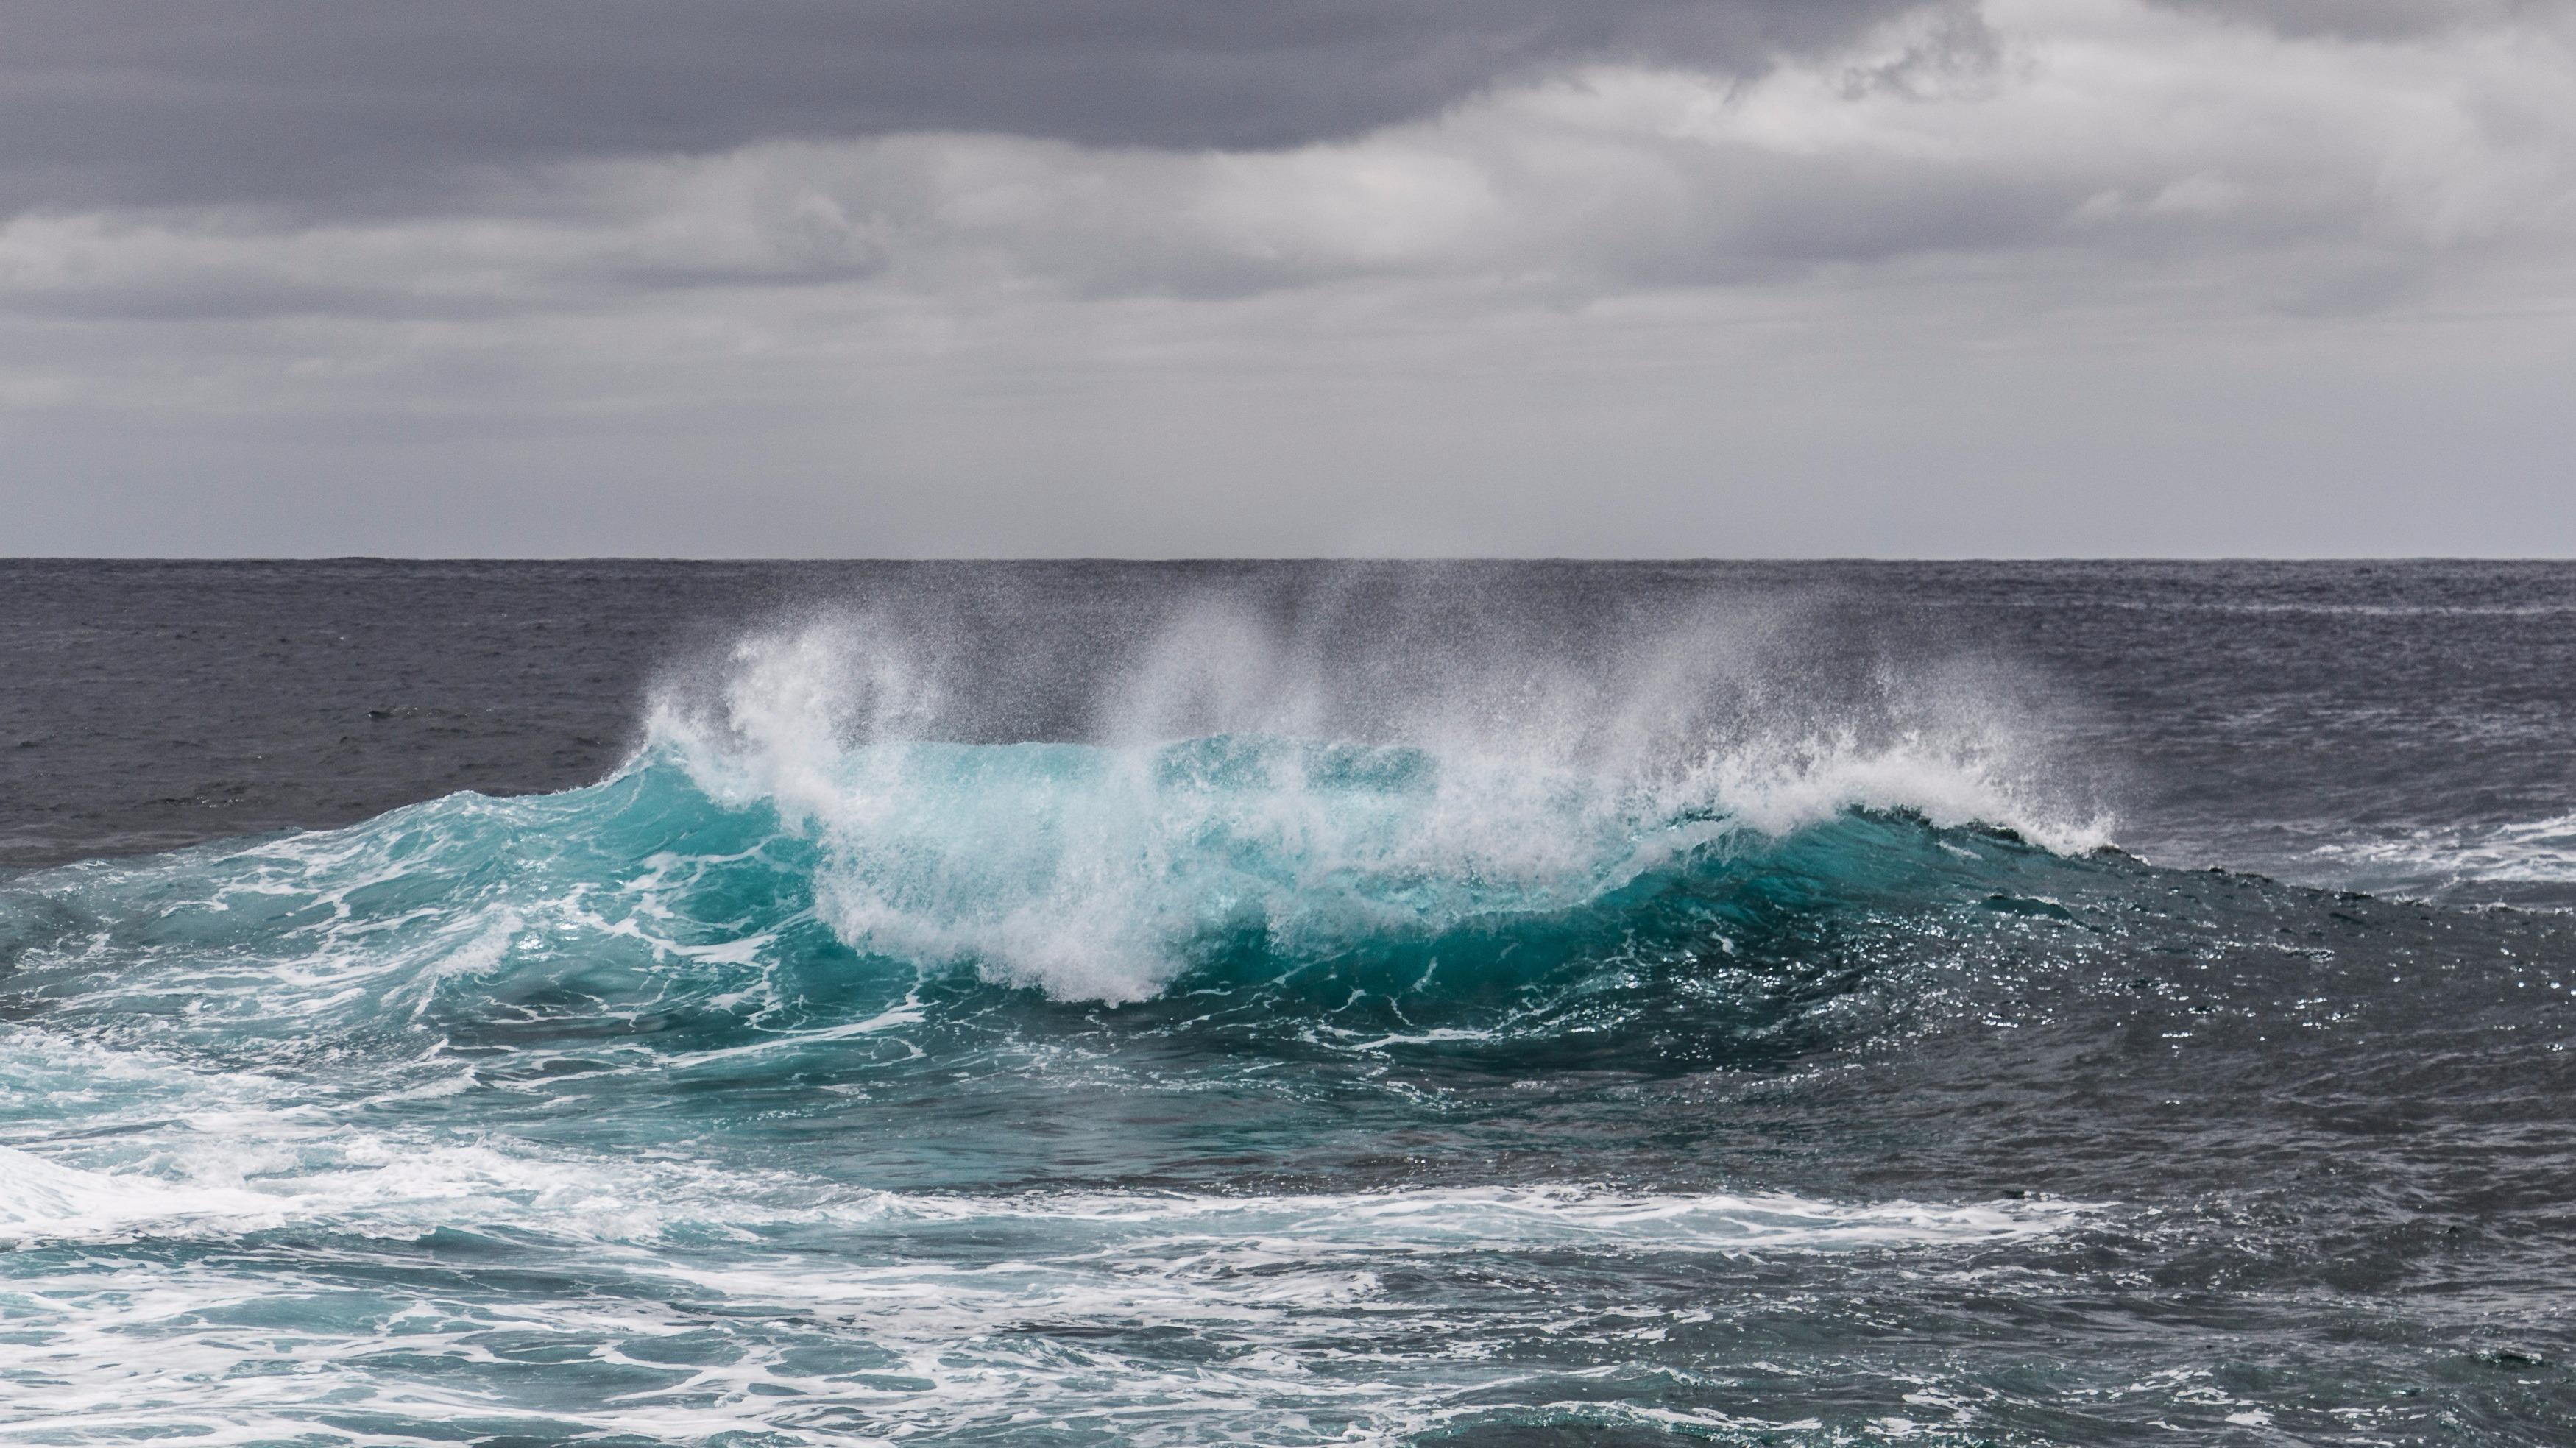 Vento Maritime ApS